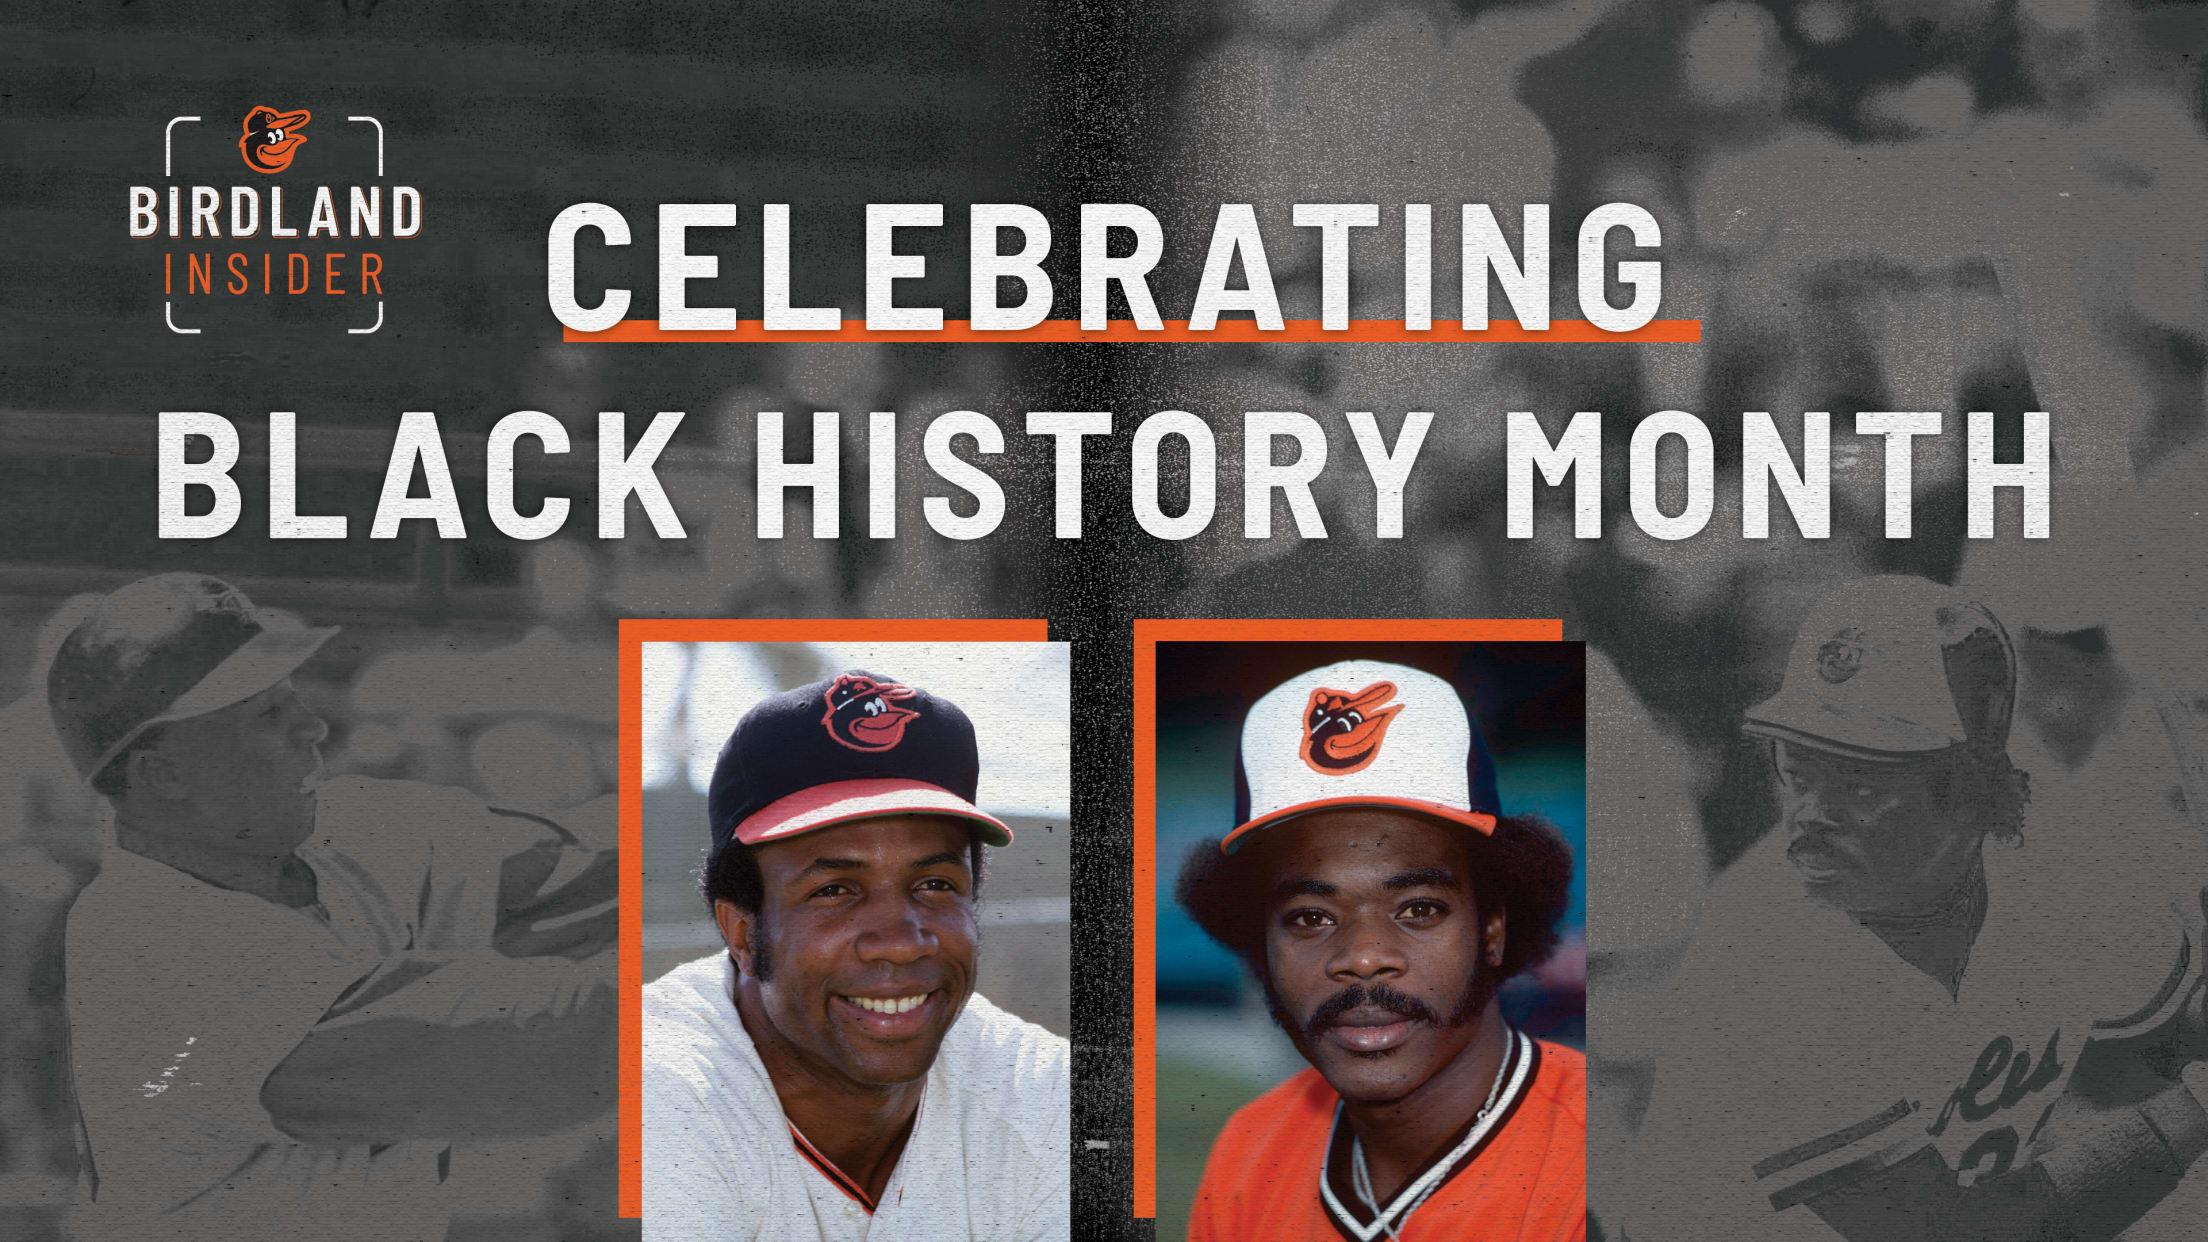 bal-image-header-Birdland-Insider-Celebrating-Black-History-Month